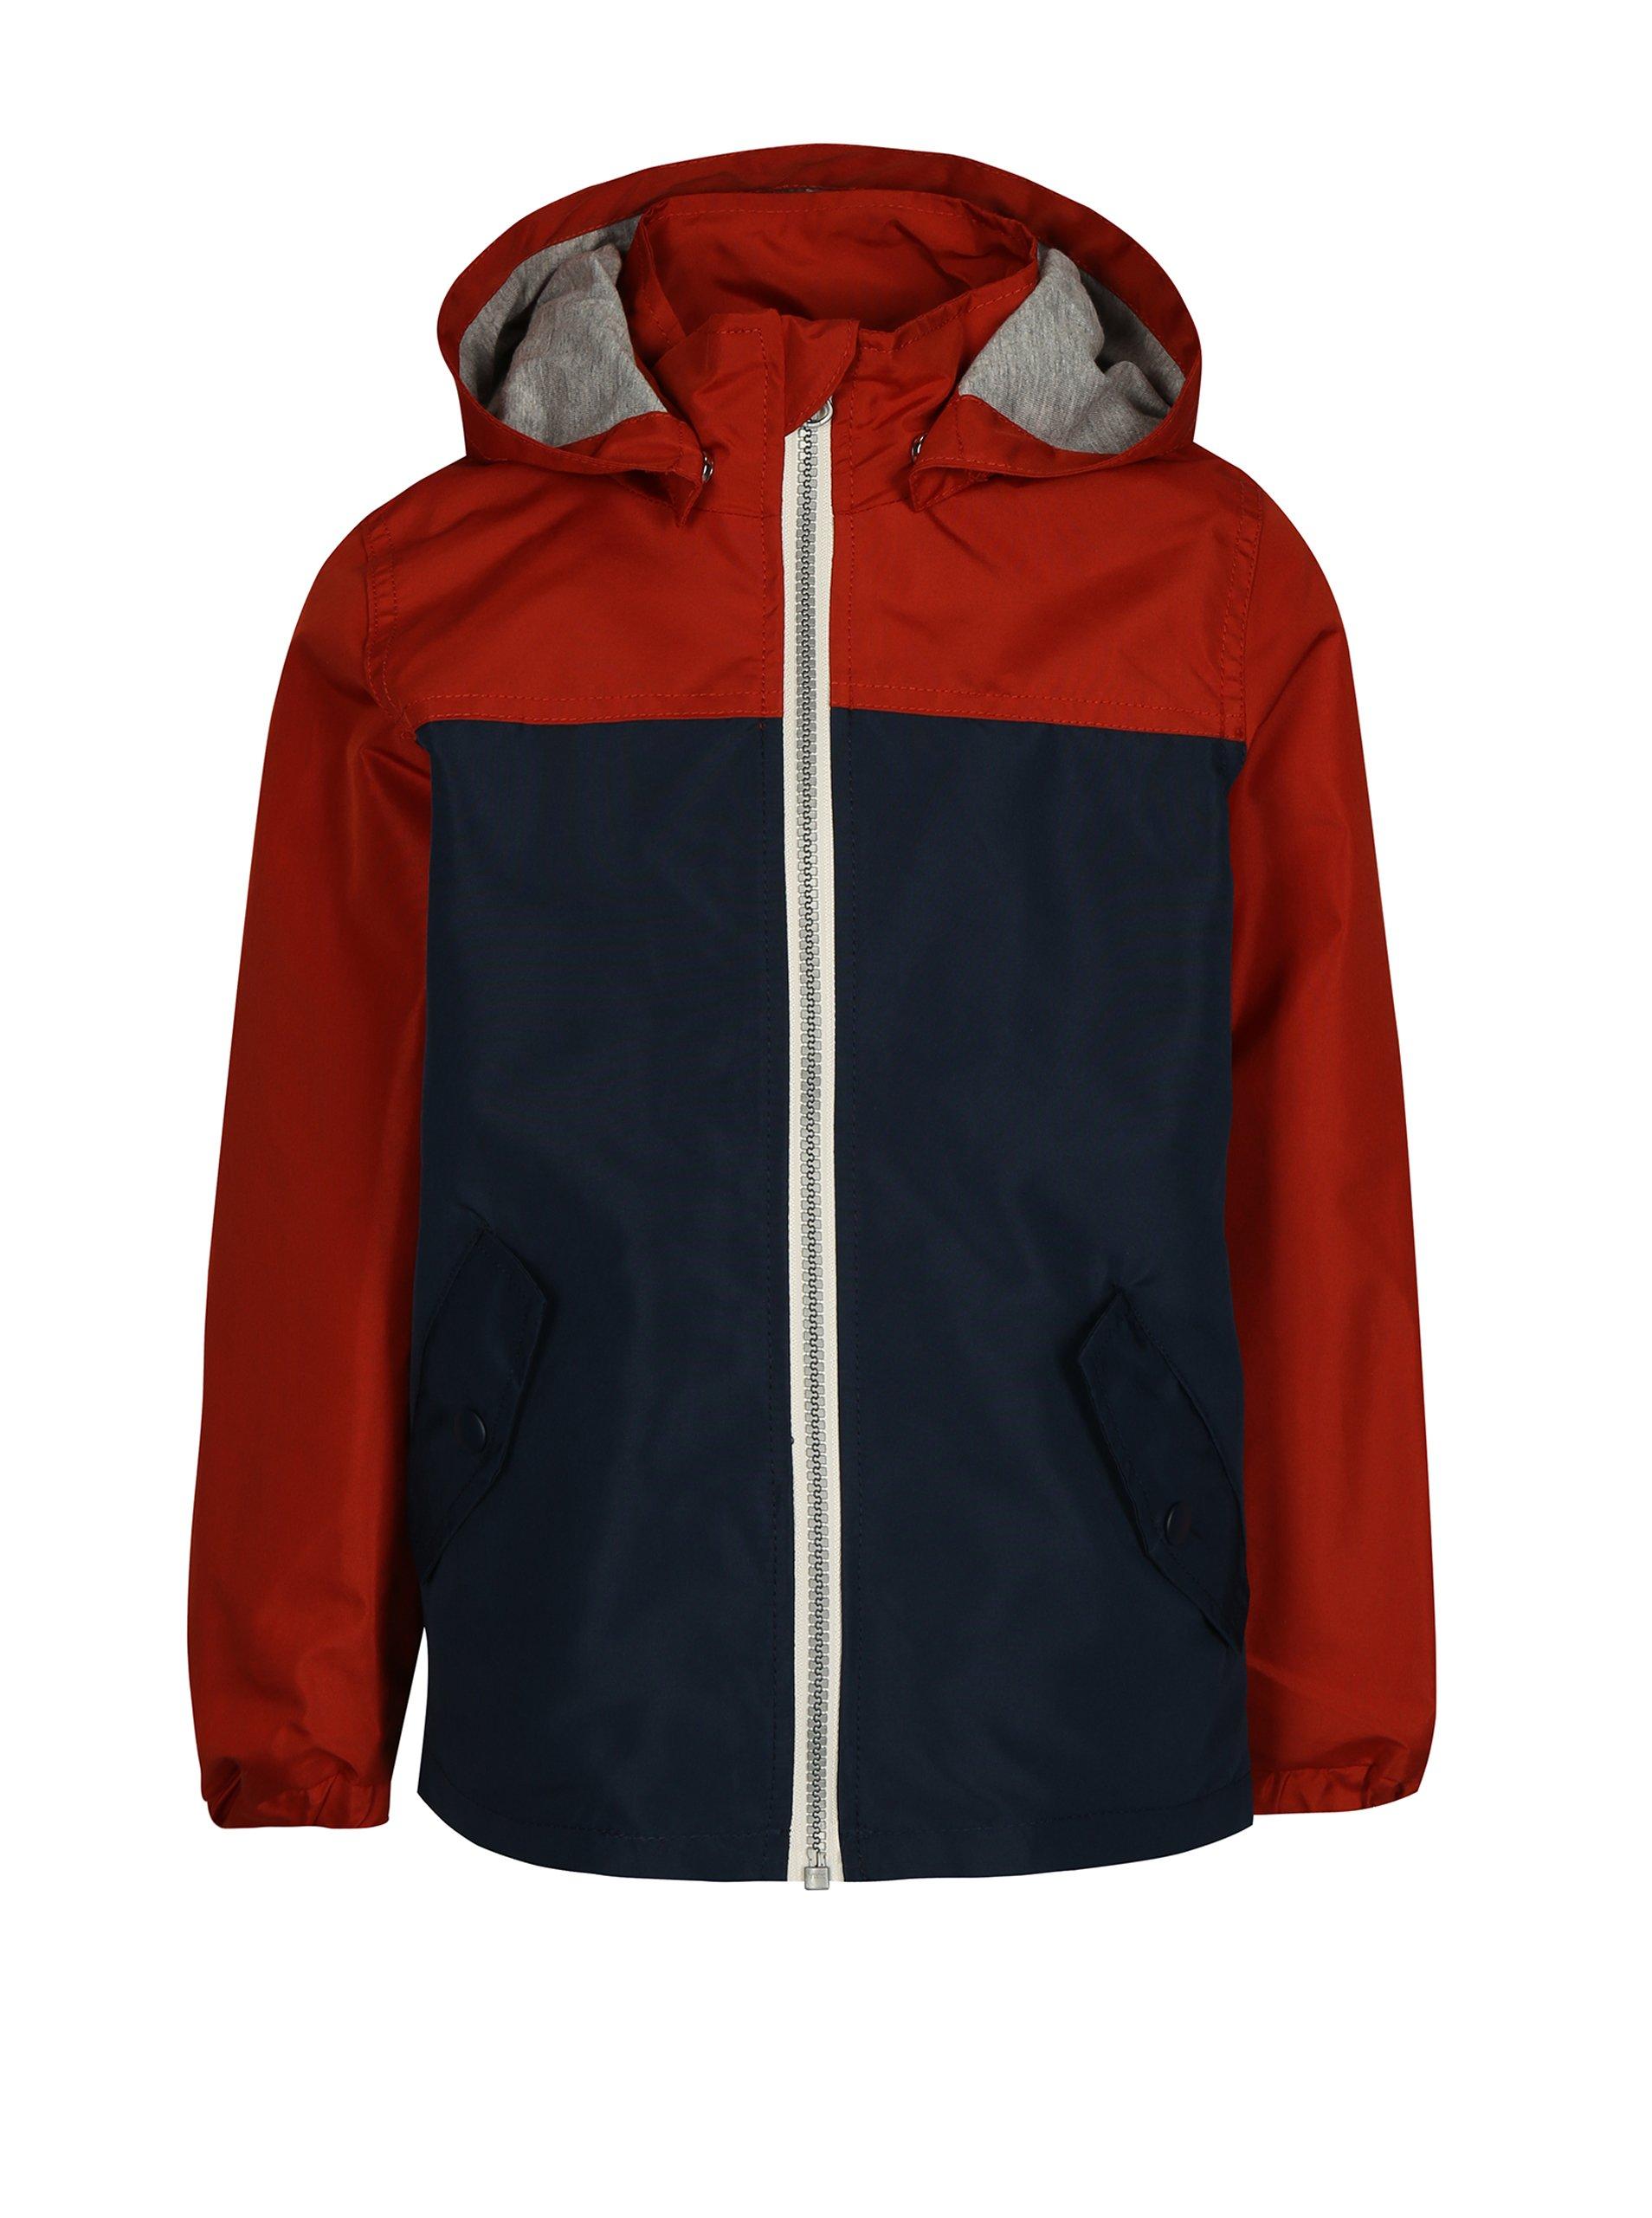 2efaf58f1692 Oranžovo-modrá chlapčenská bunda s kapucňou name it Mads